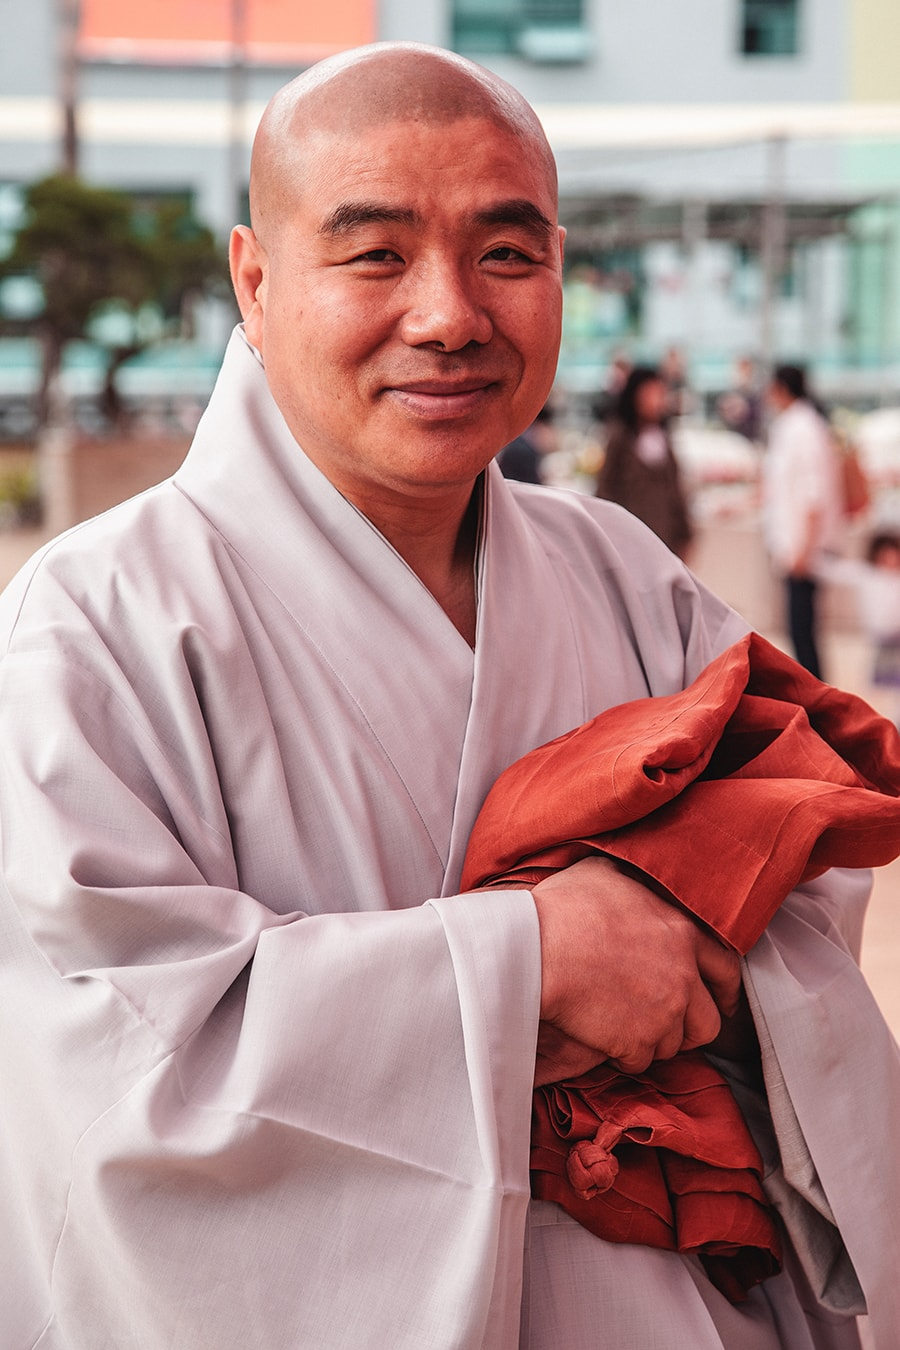 Buddhist monk at Jogyesa temple in Seoul, Korea.